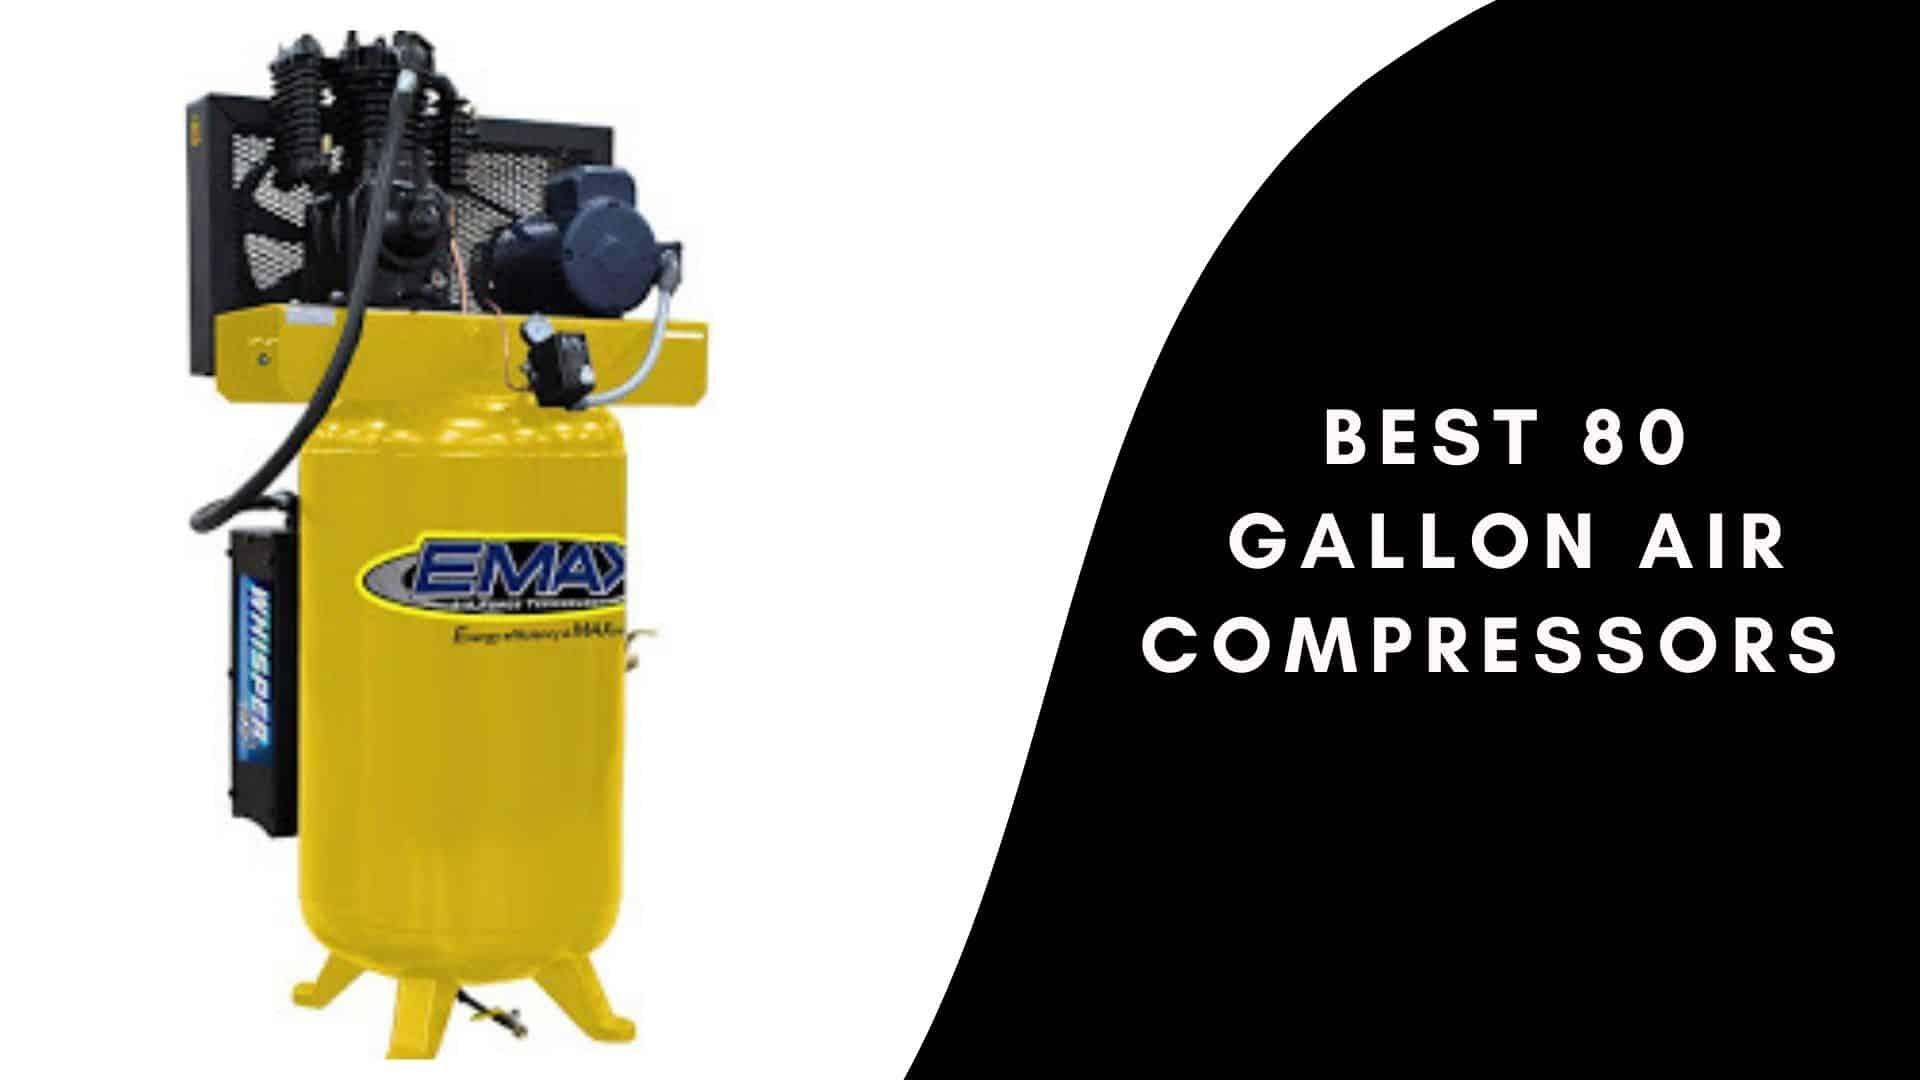 Best 80 Gallon Air Compressors